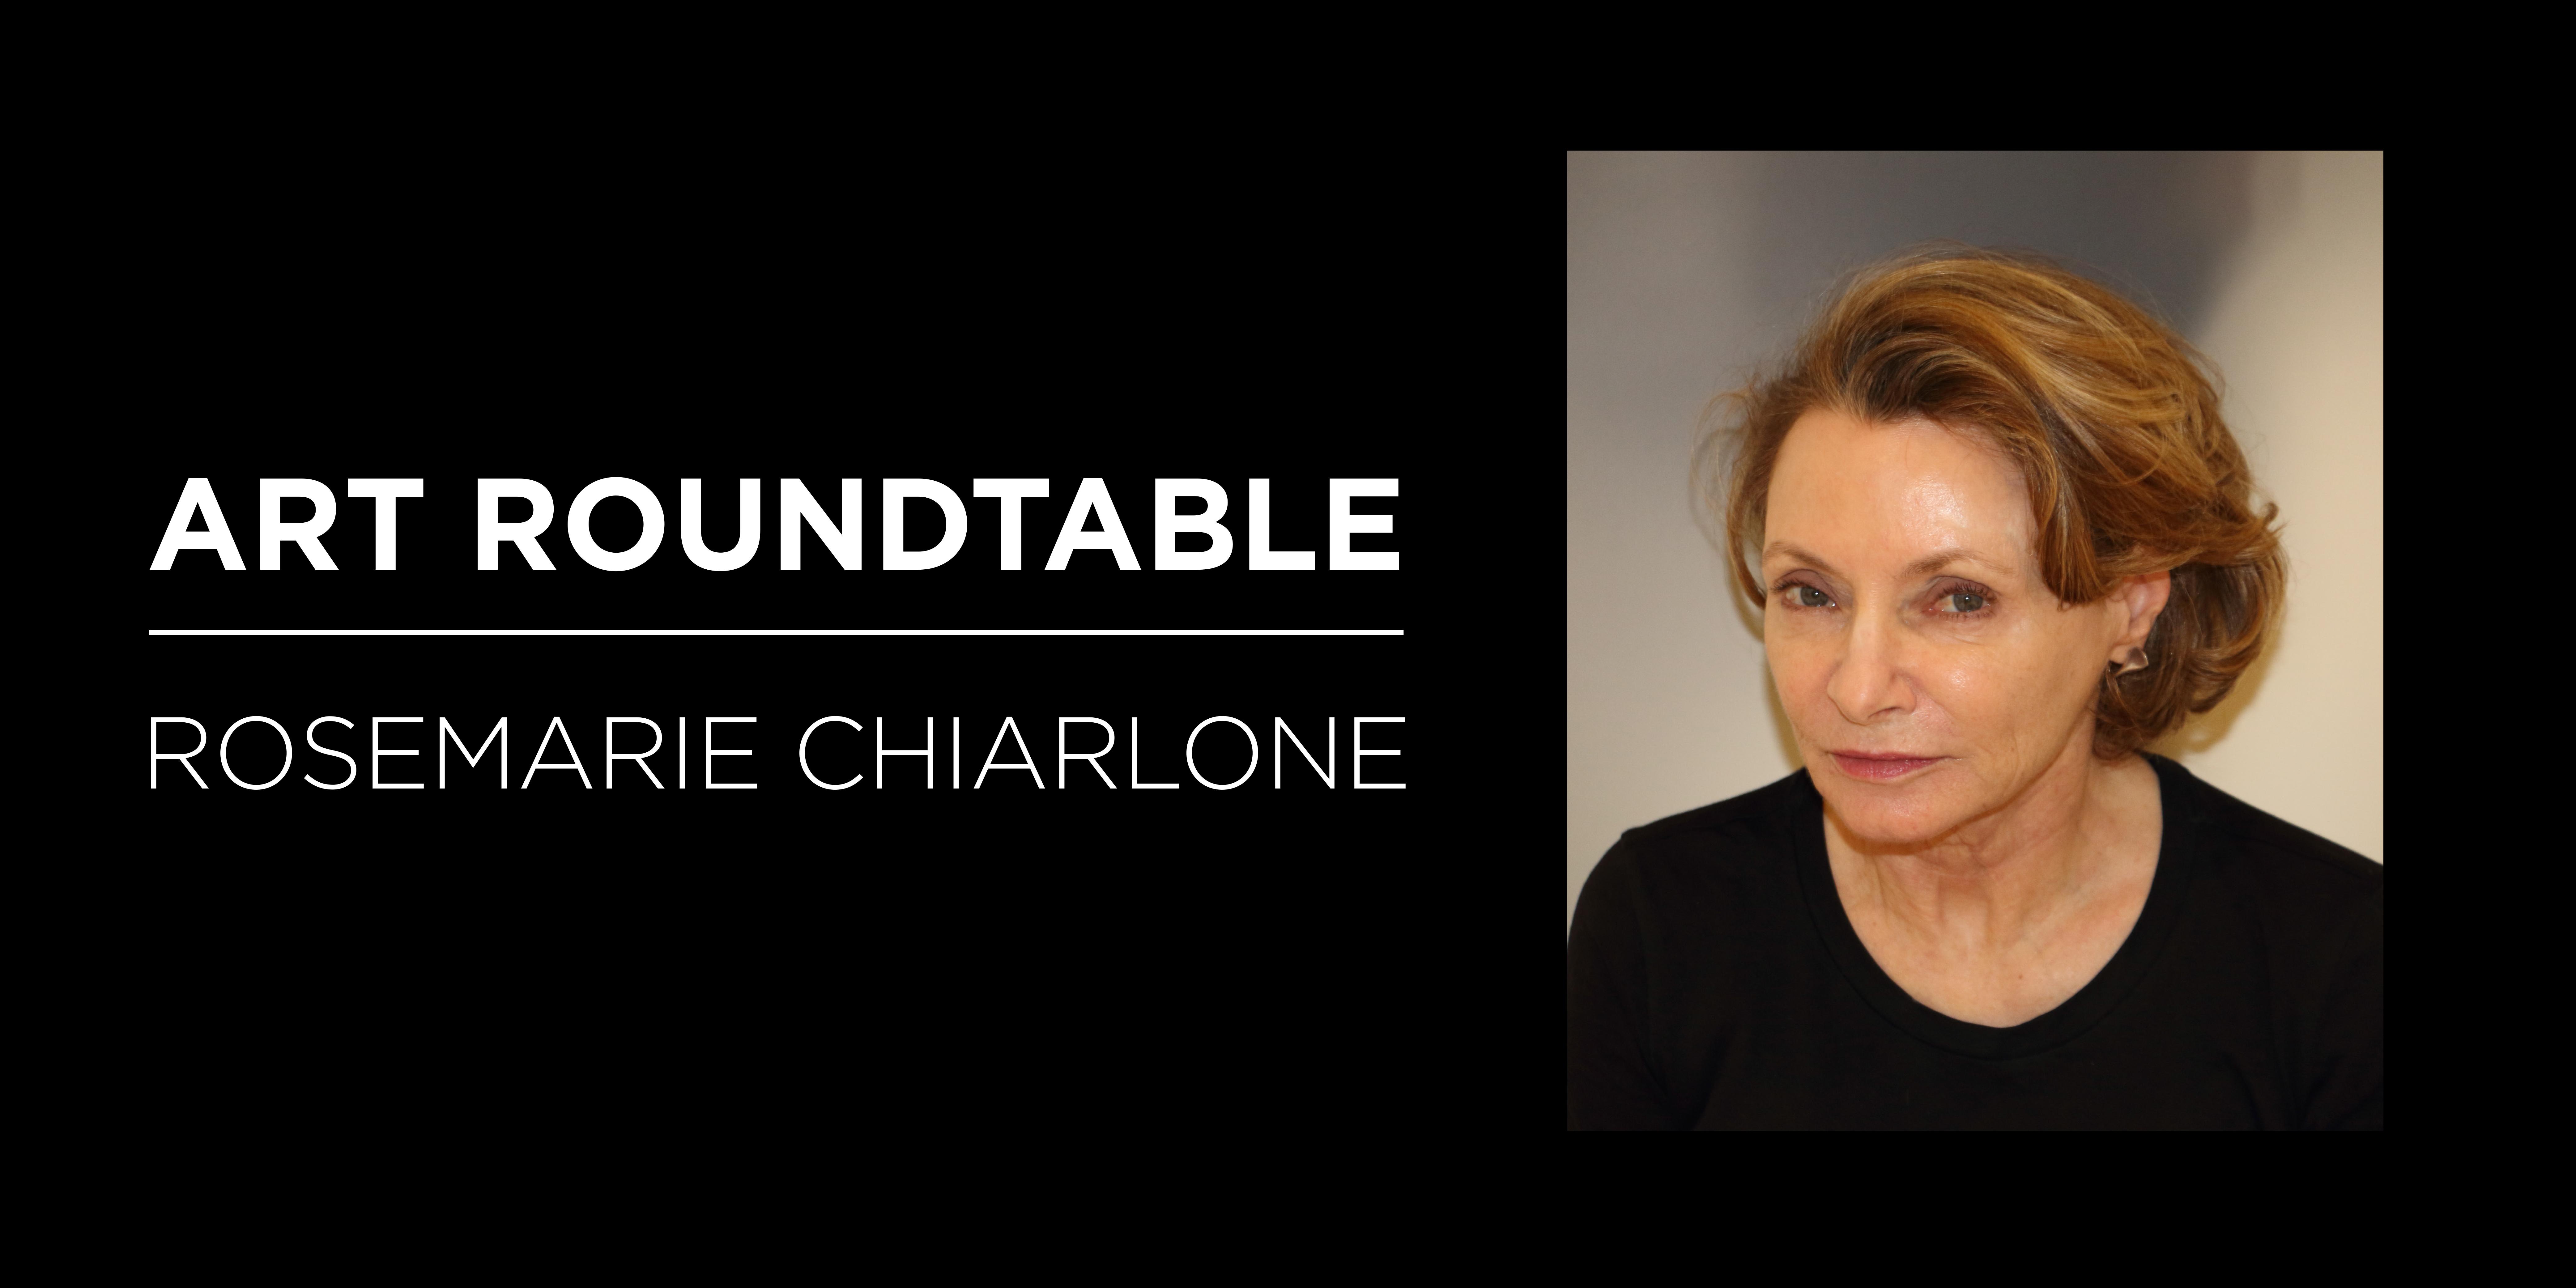 RoseMarie Chiarone Roundtable